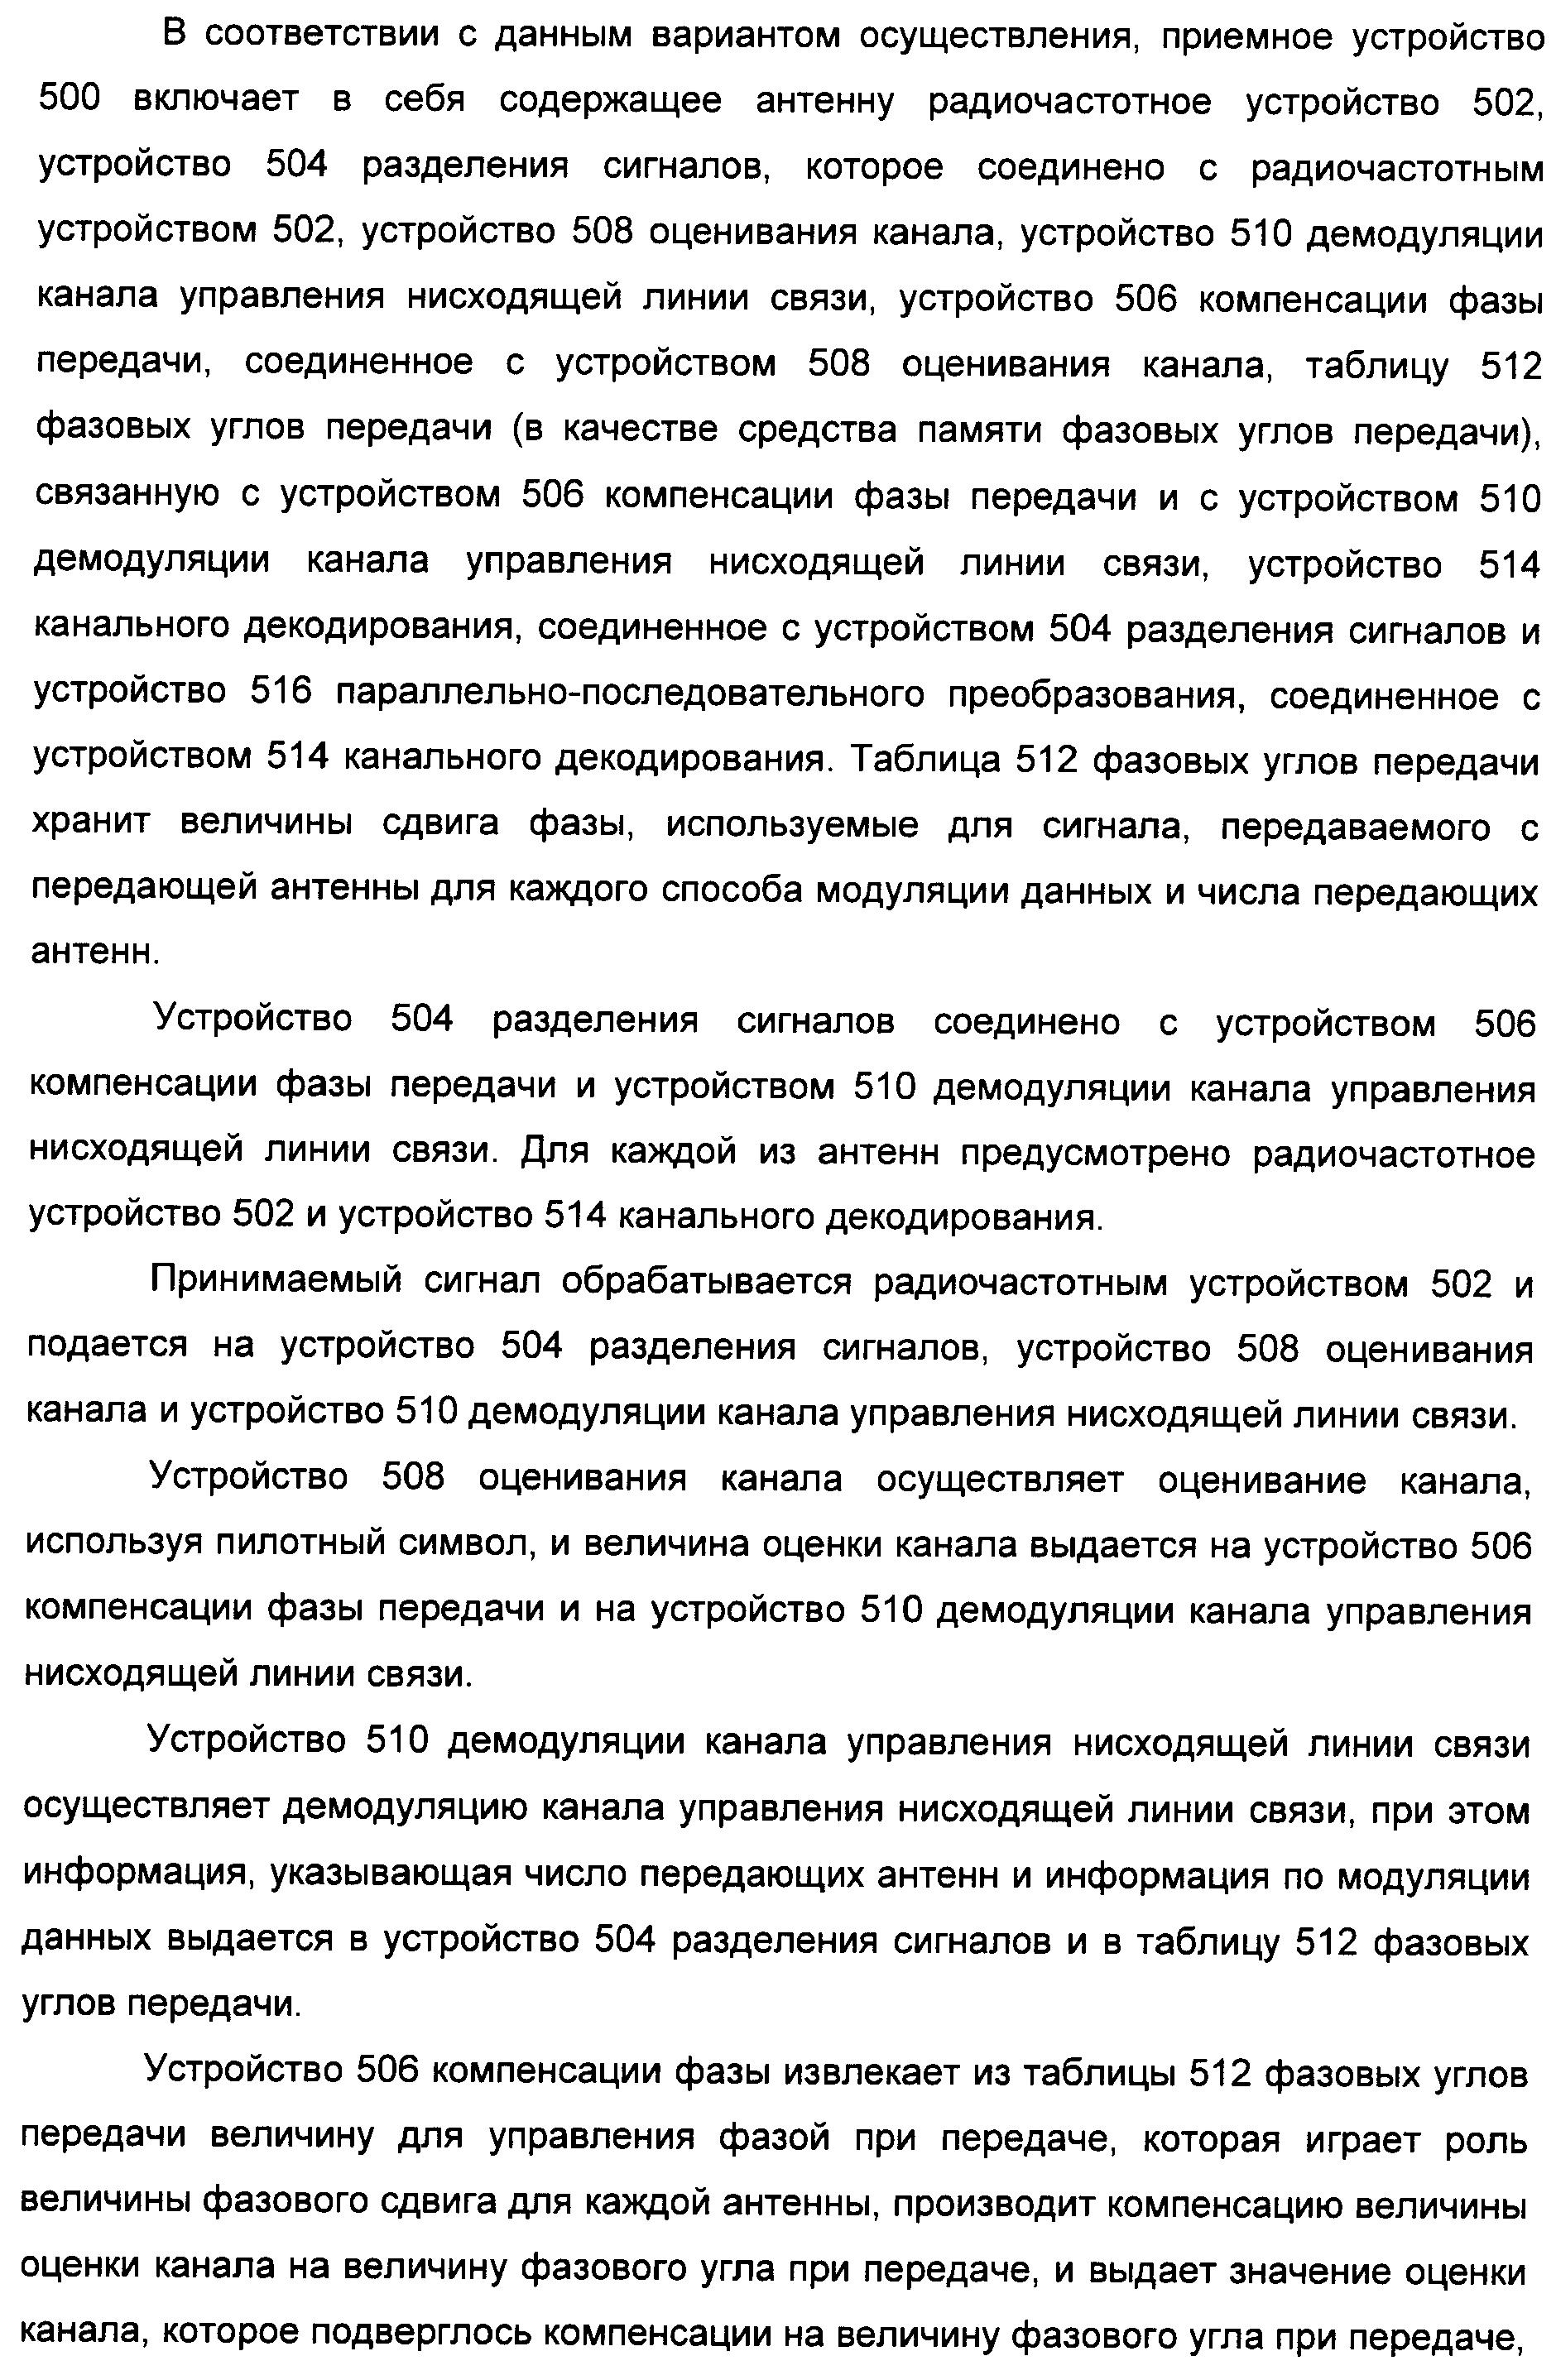 Figure 00000046